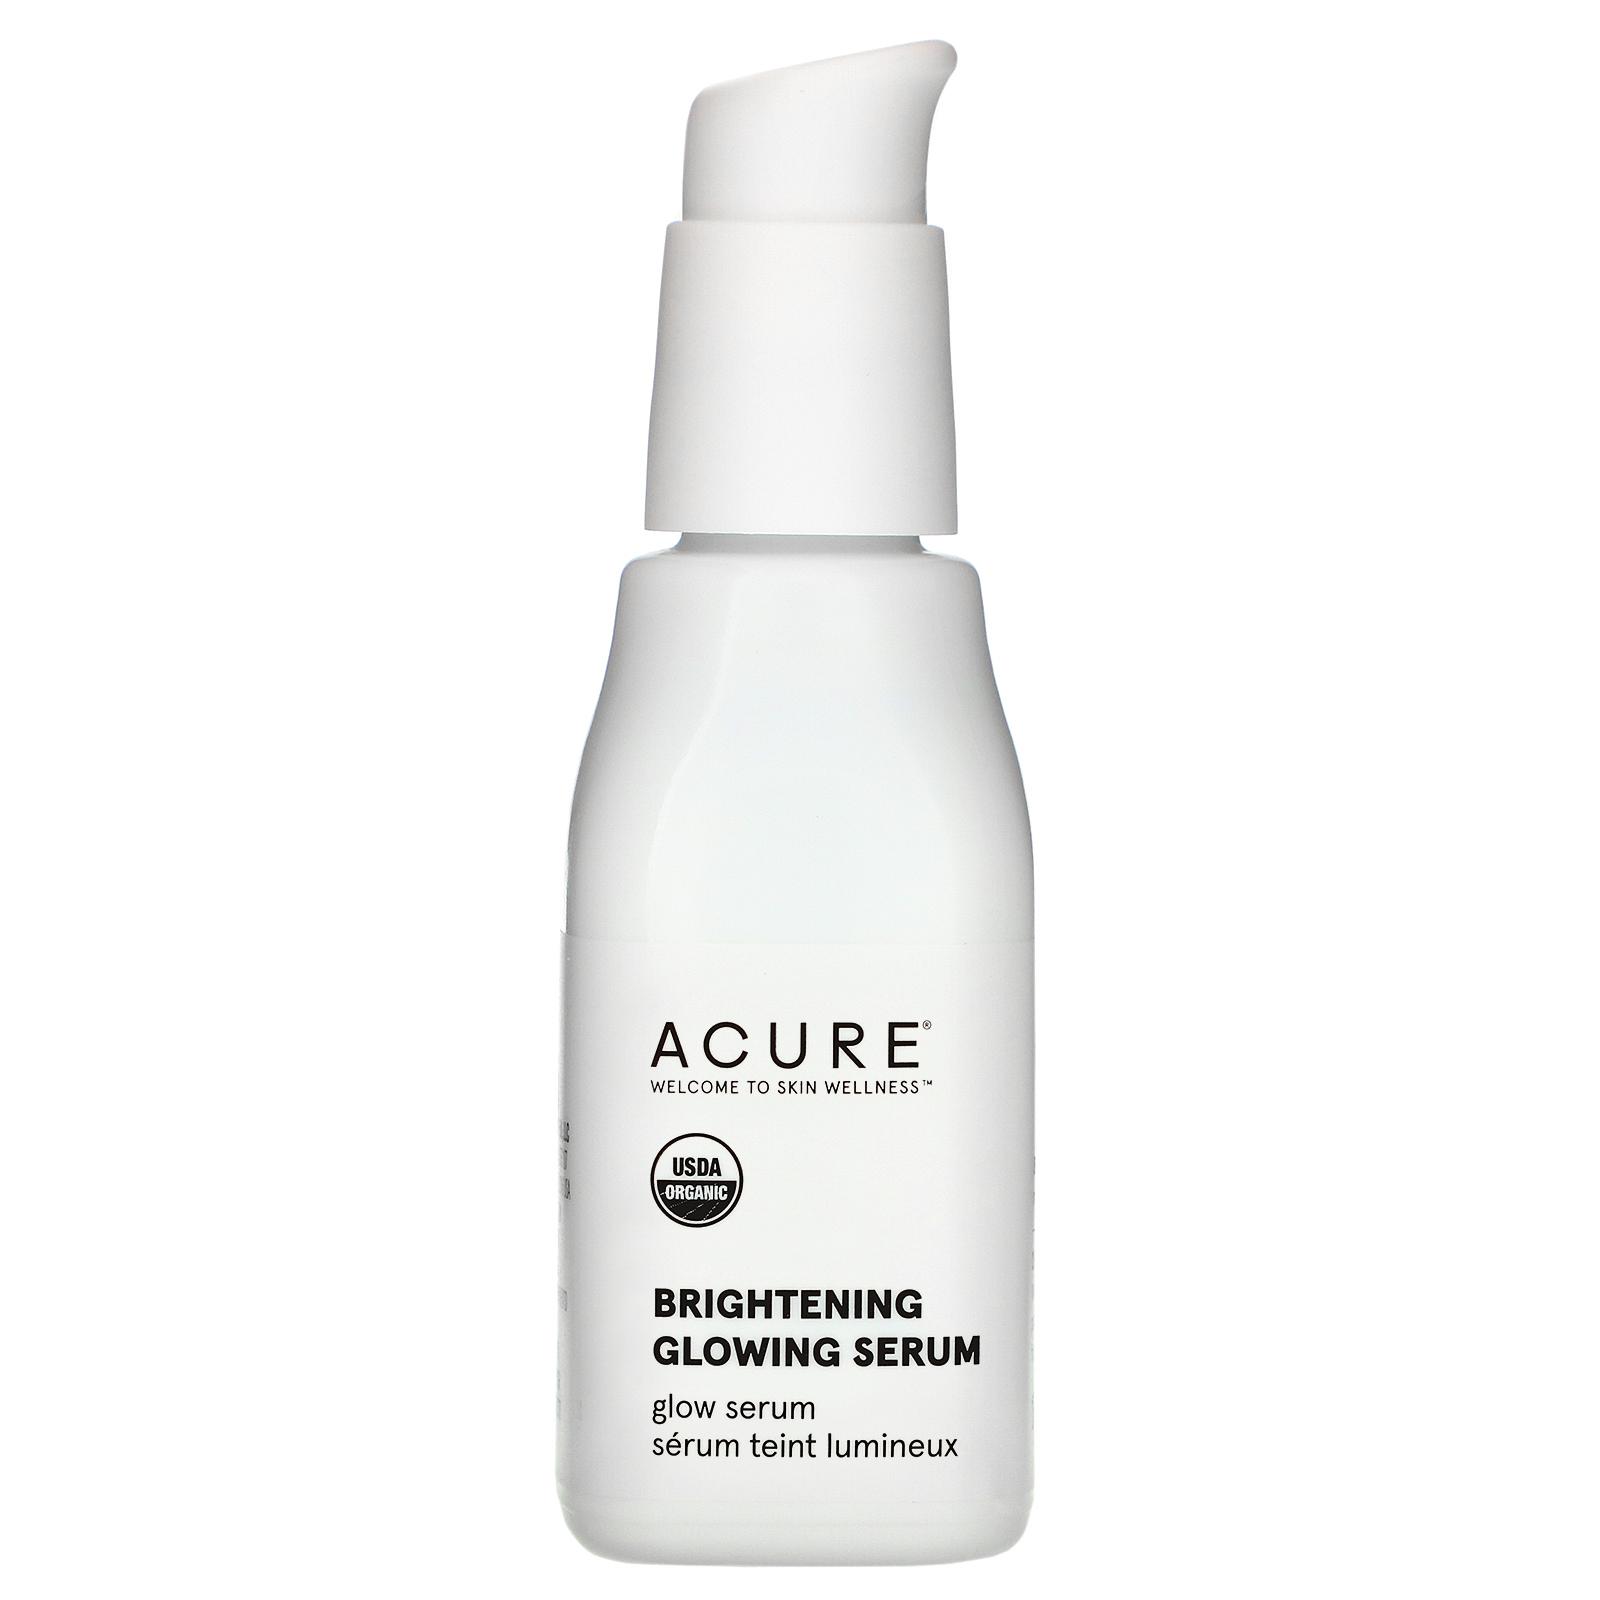 Acure Organics Brilliantly Brightening Glowing Serum 1 Fl